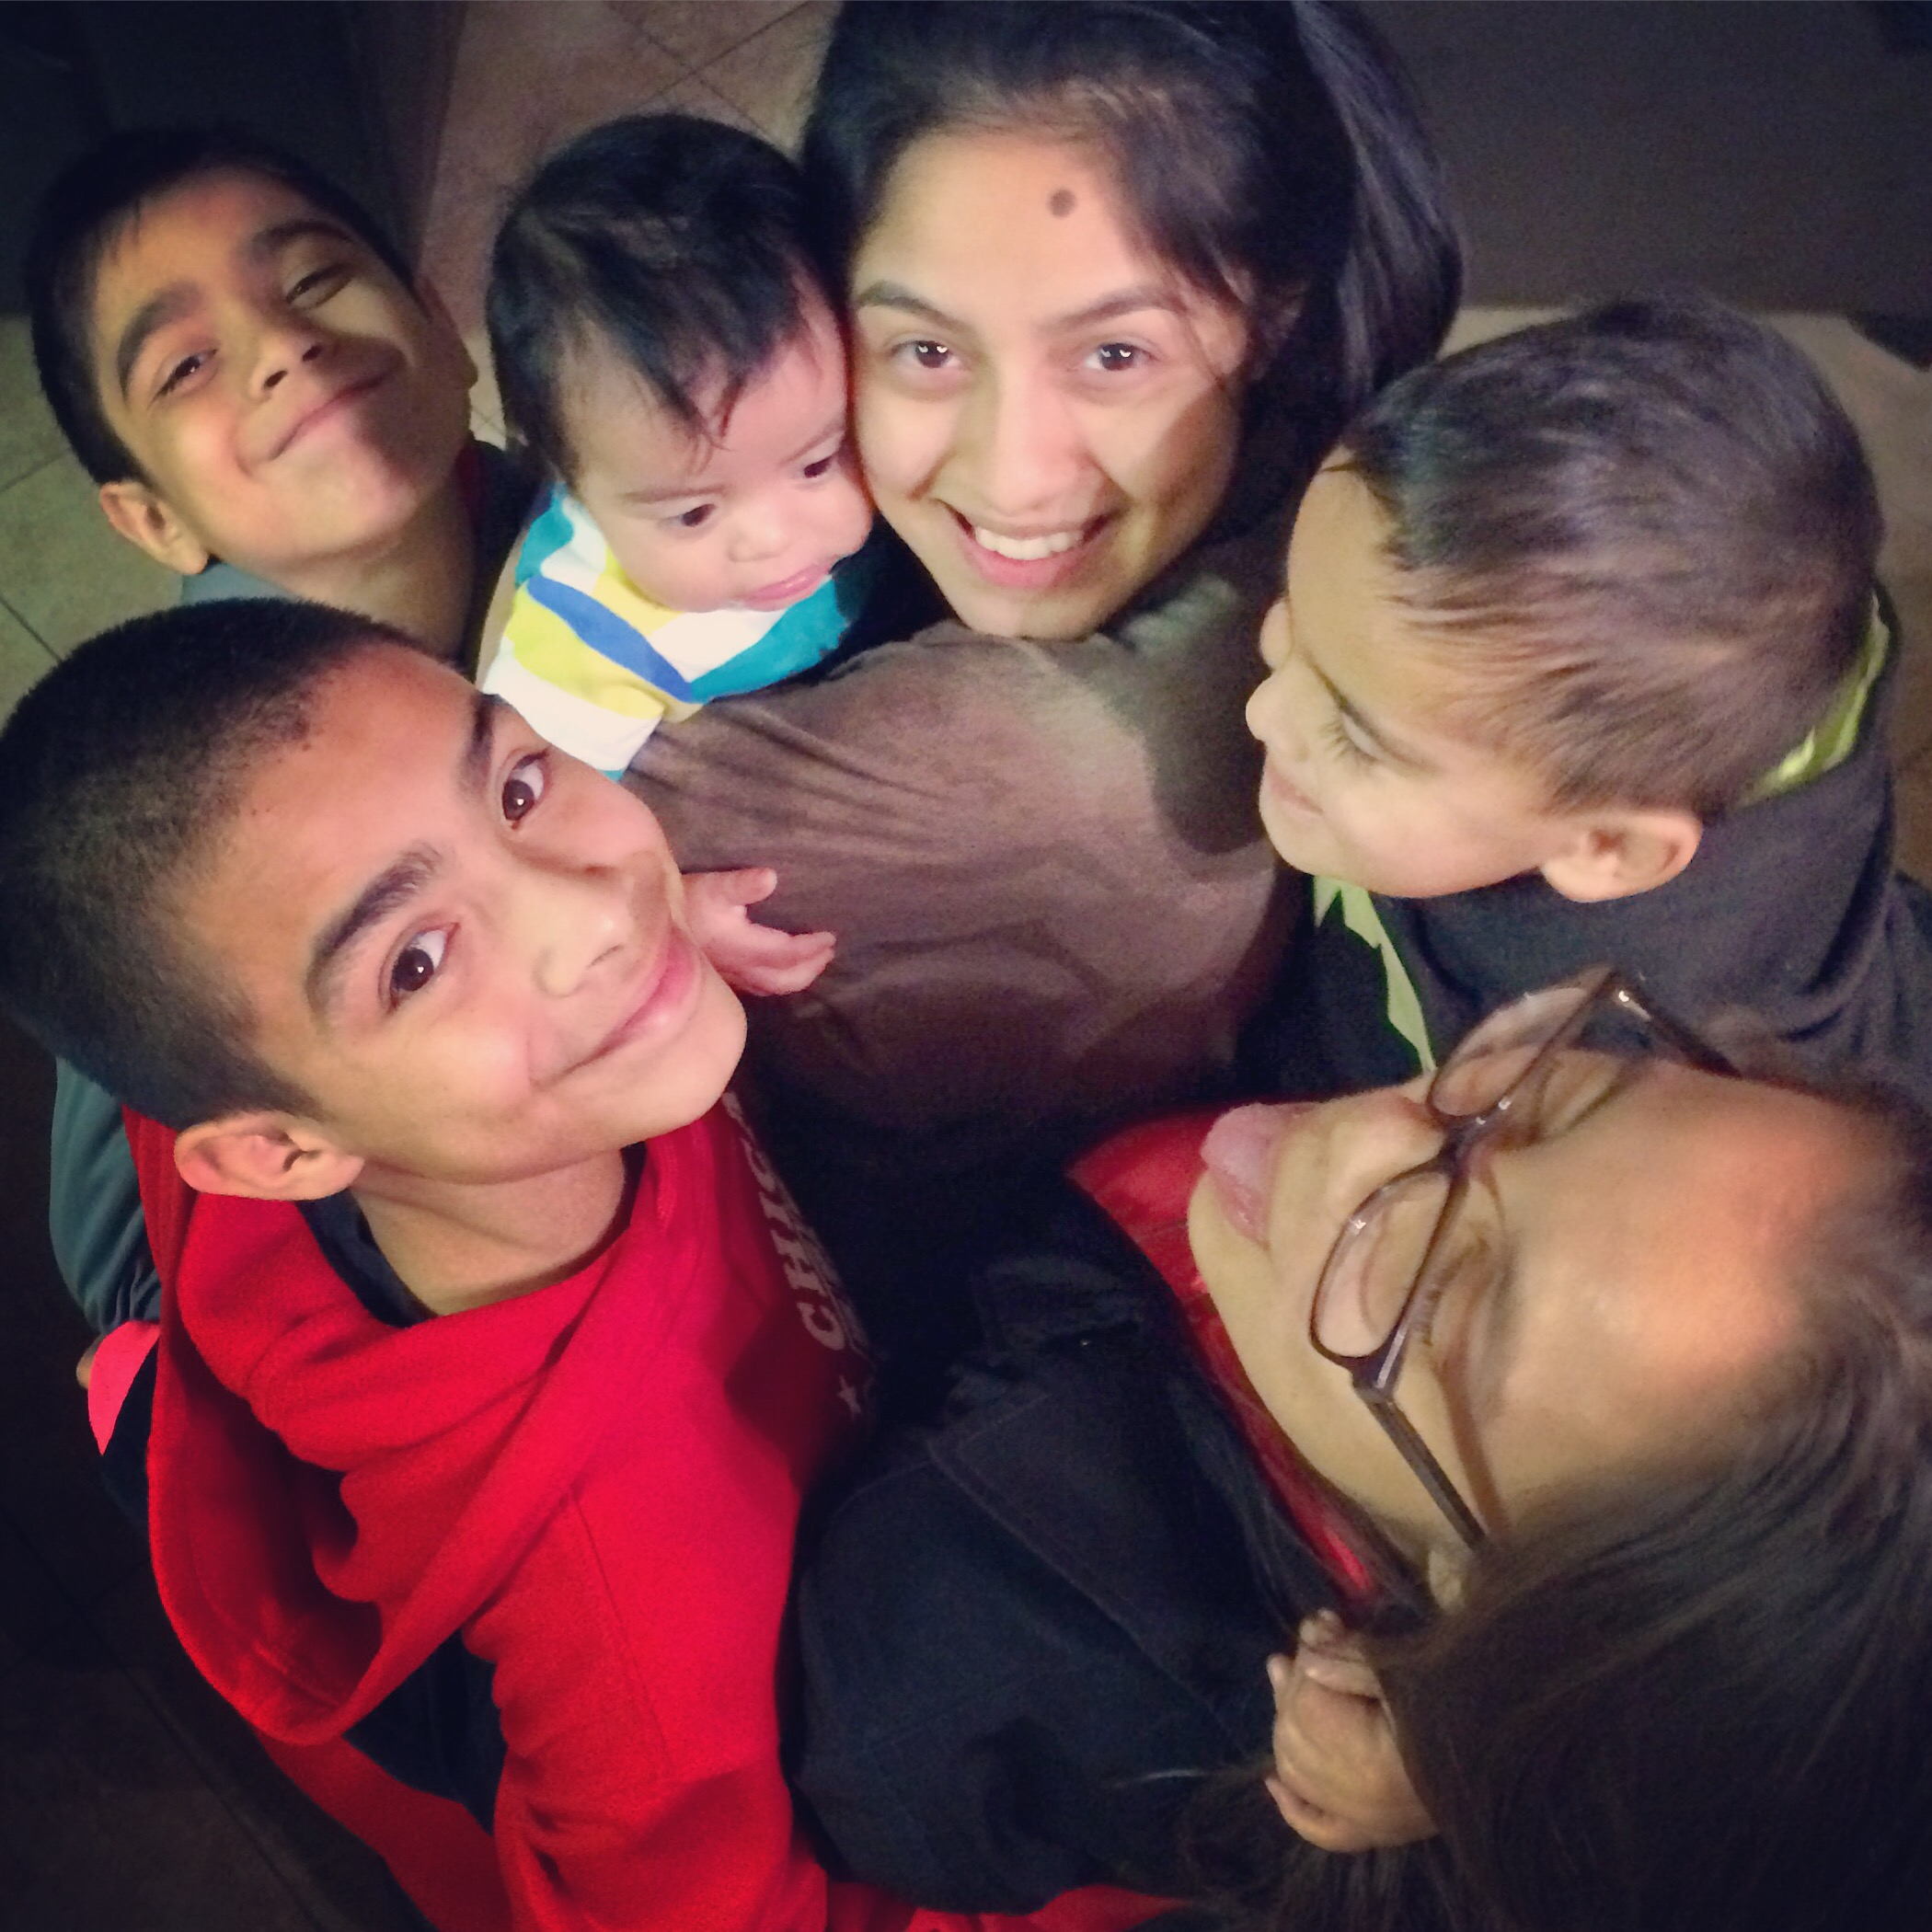 Children in a group hug